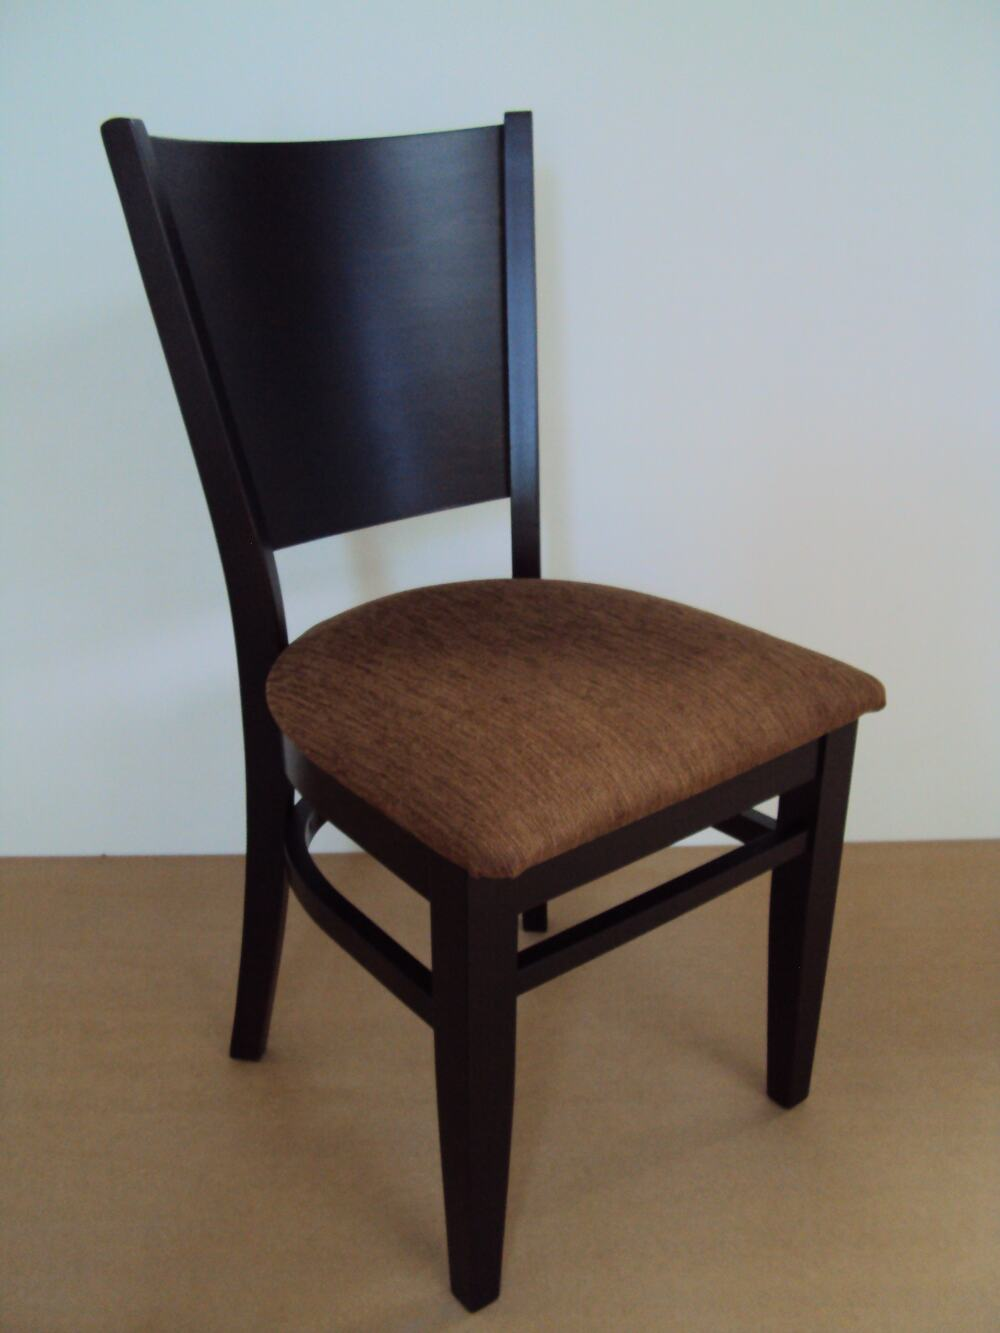 Professional Chair Venezia For Restaurant Cafe Bar